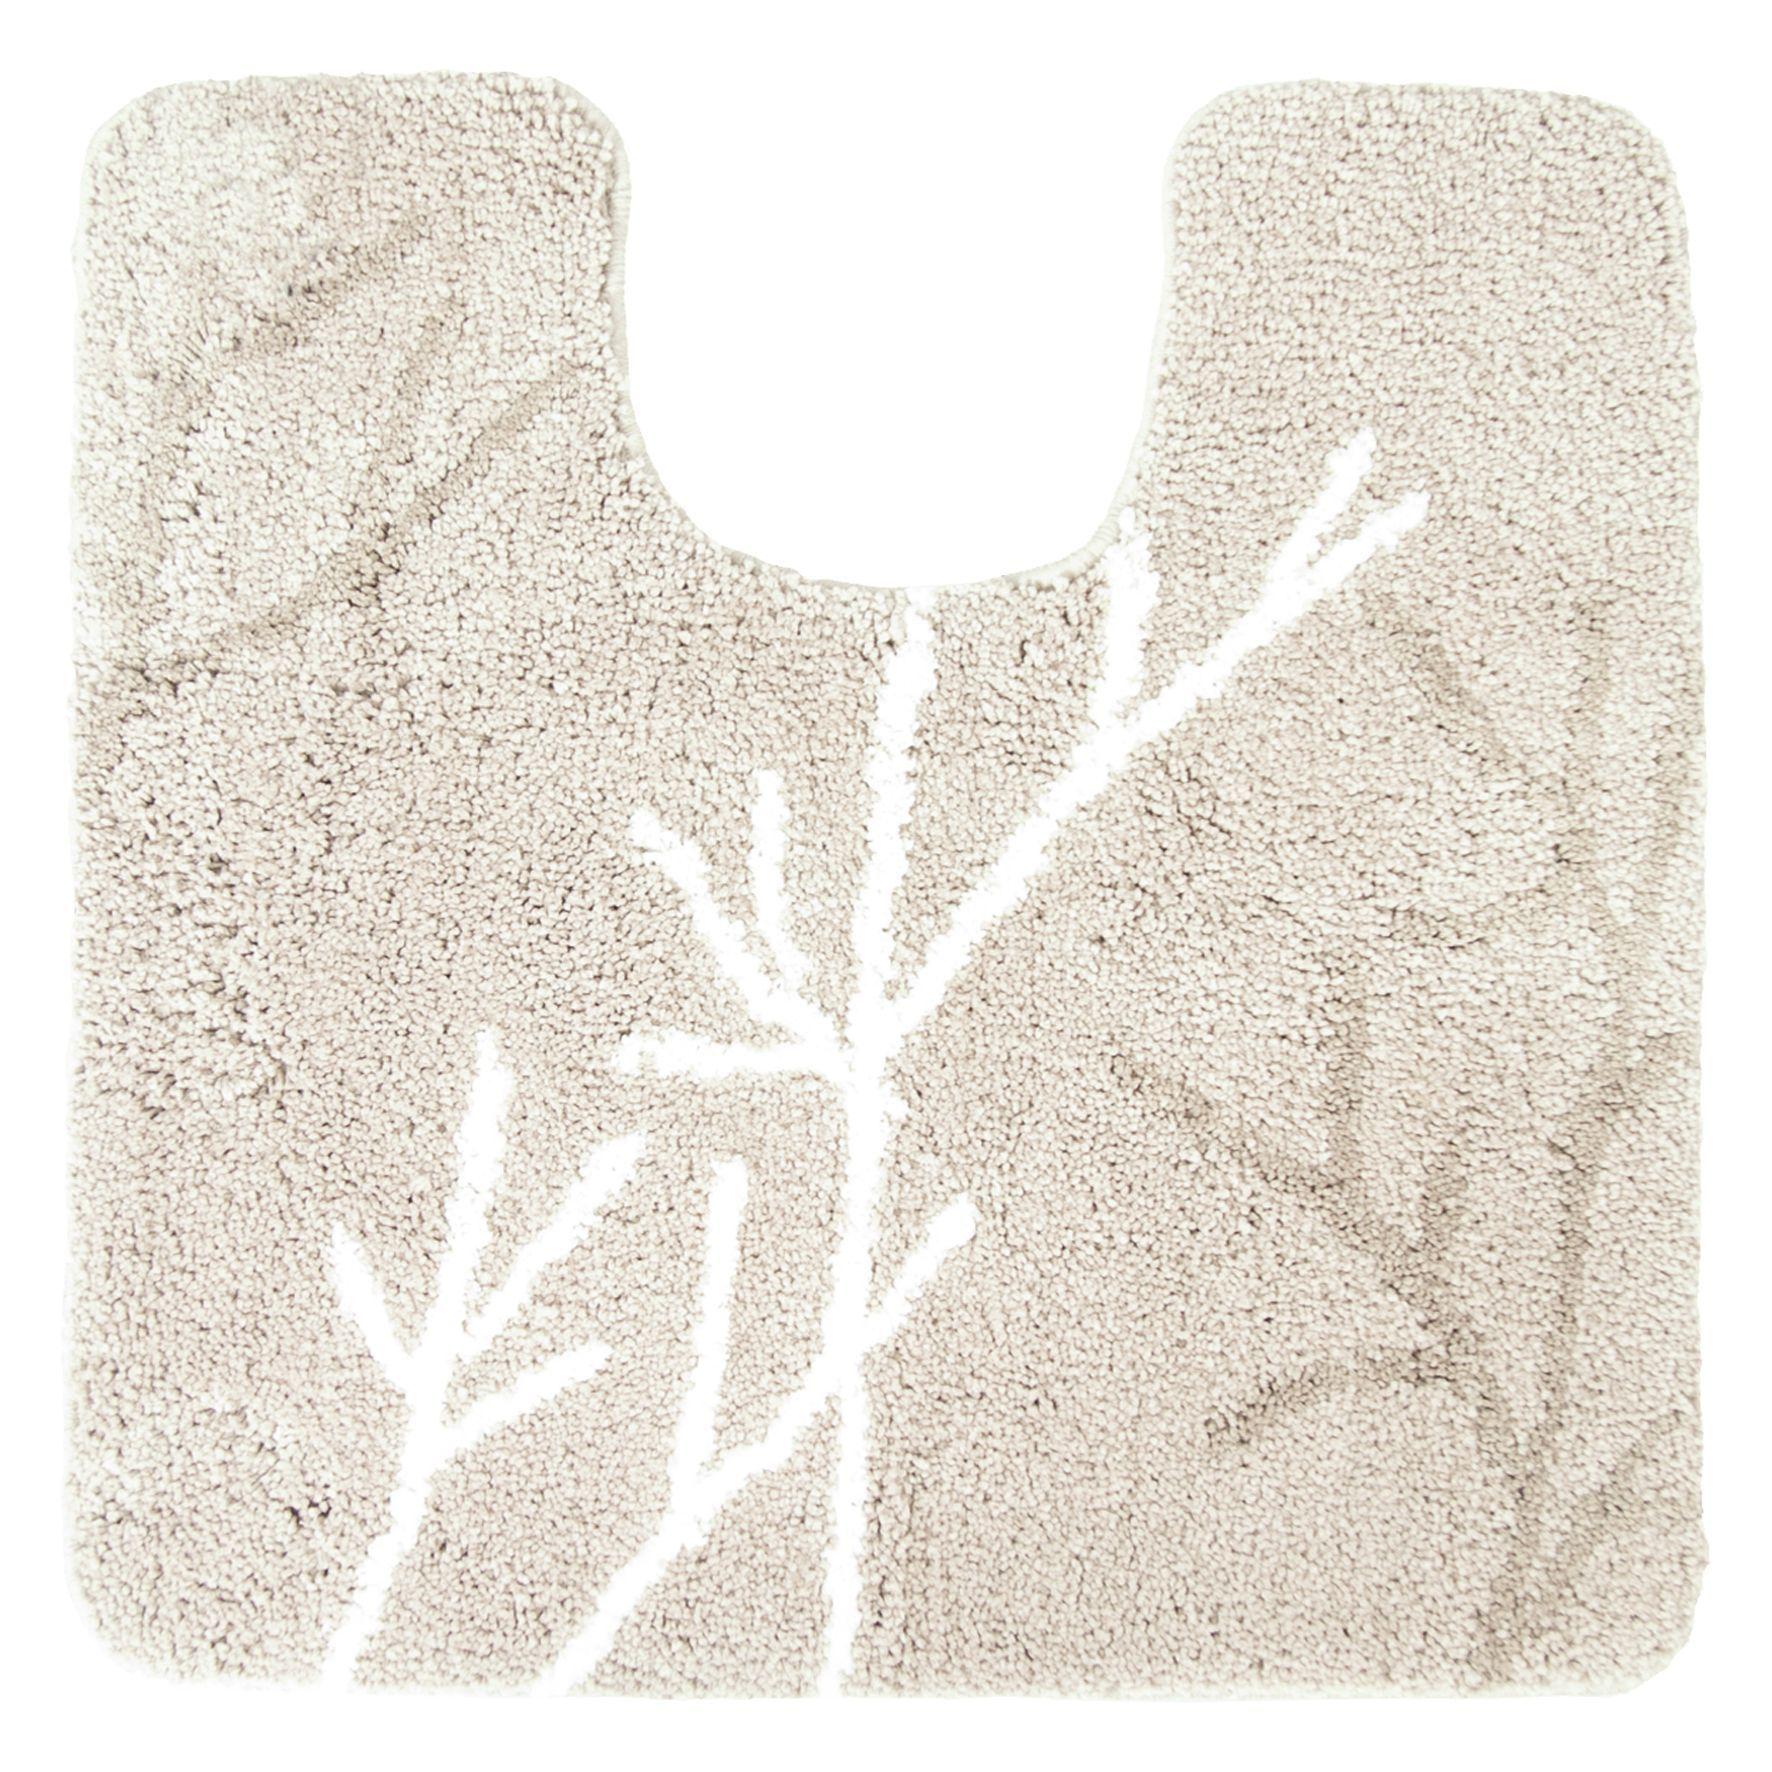 Differnz Leaf toiletmat 60x60 beige